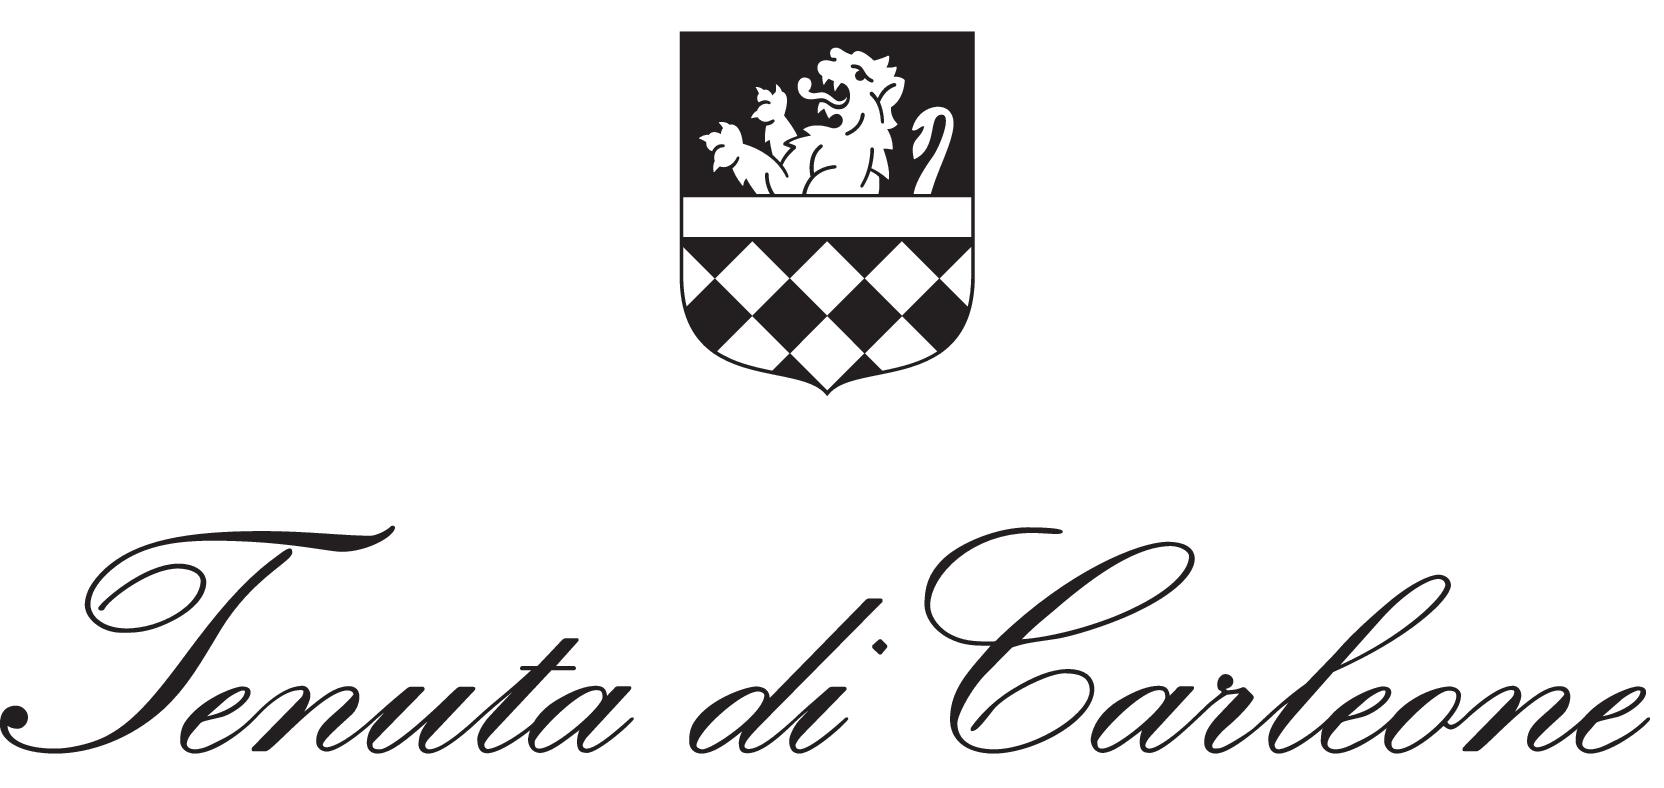 www.tenutadicarleone